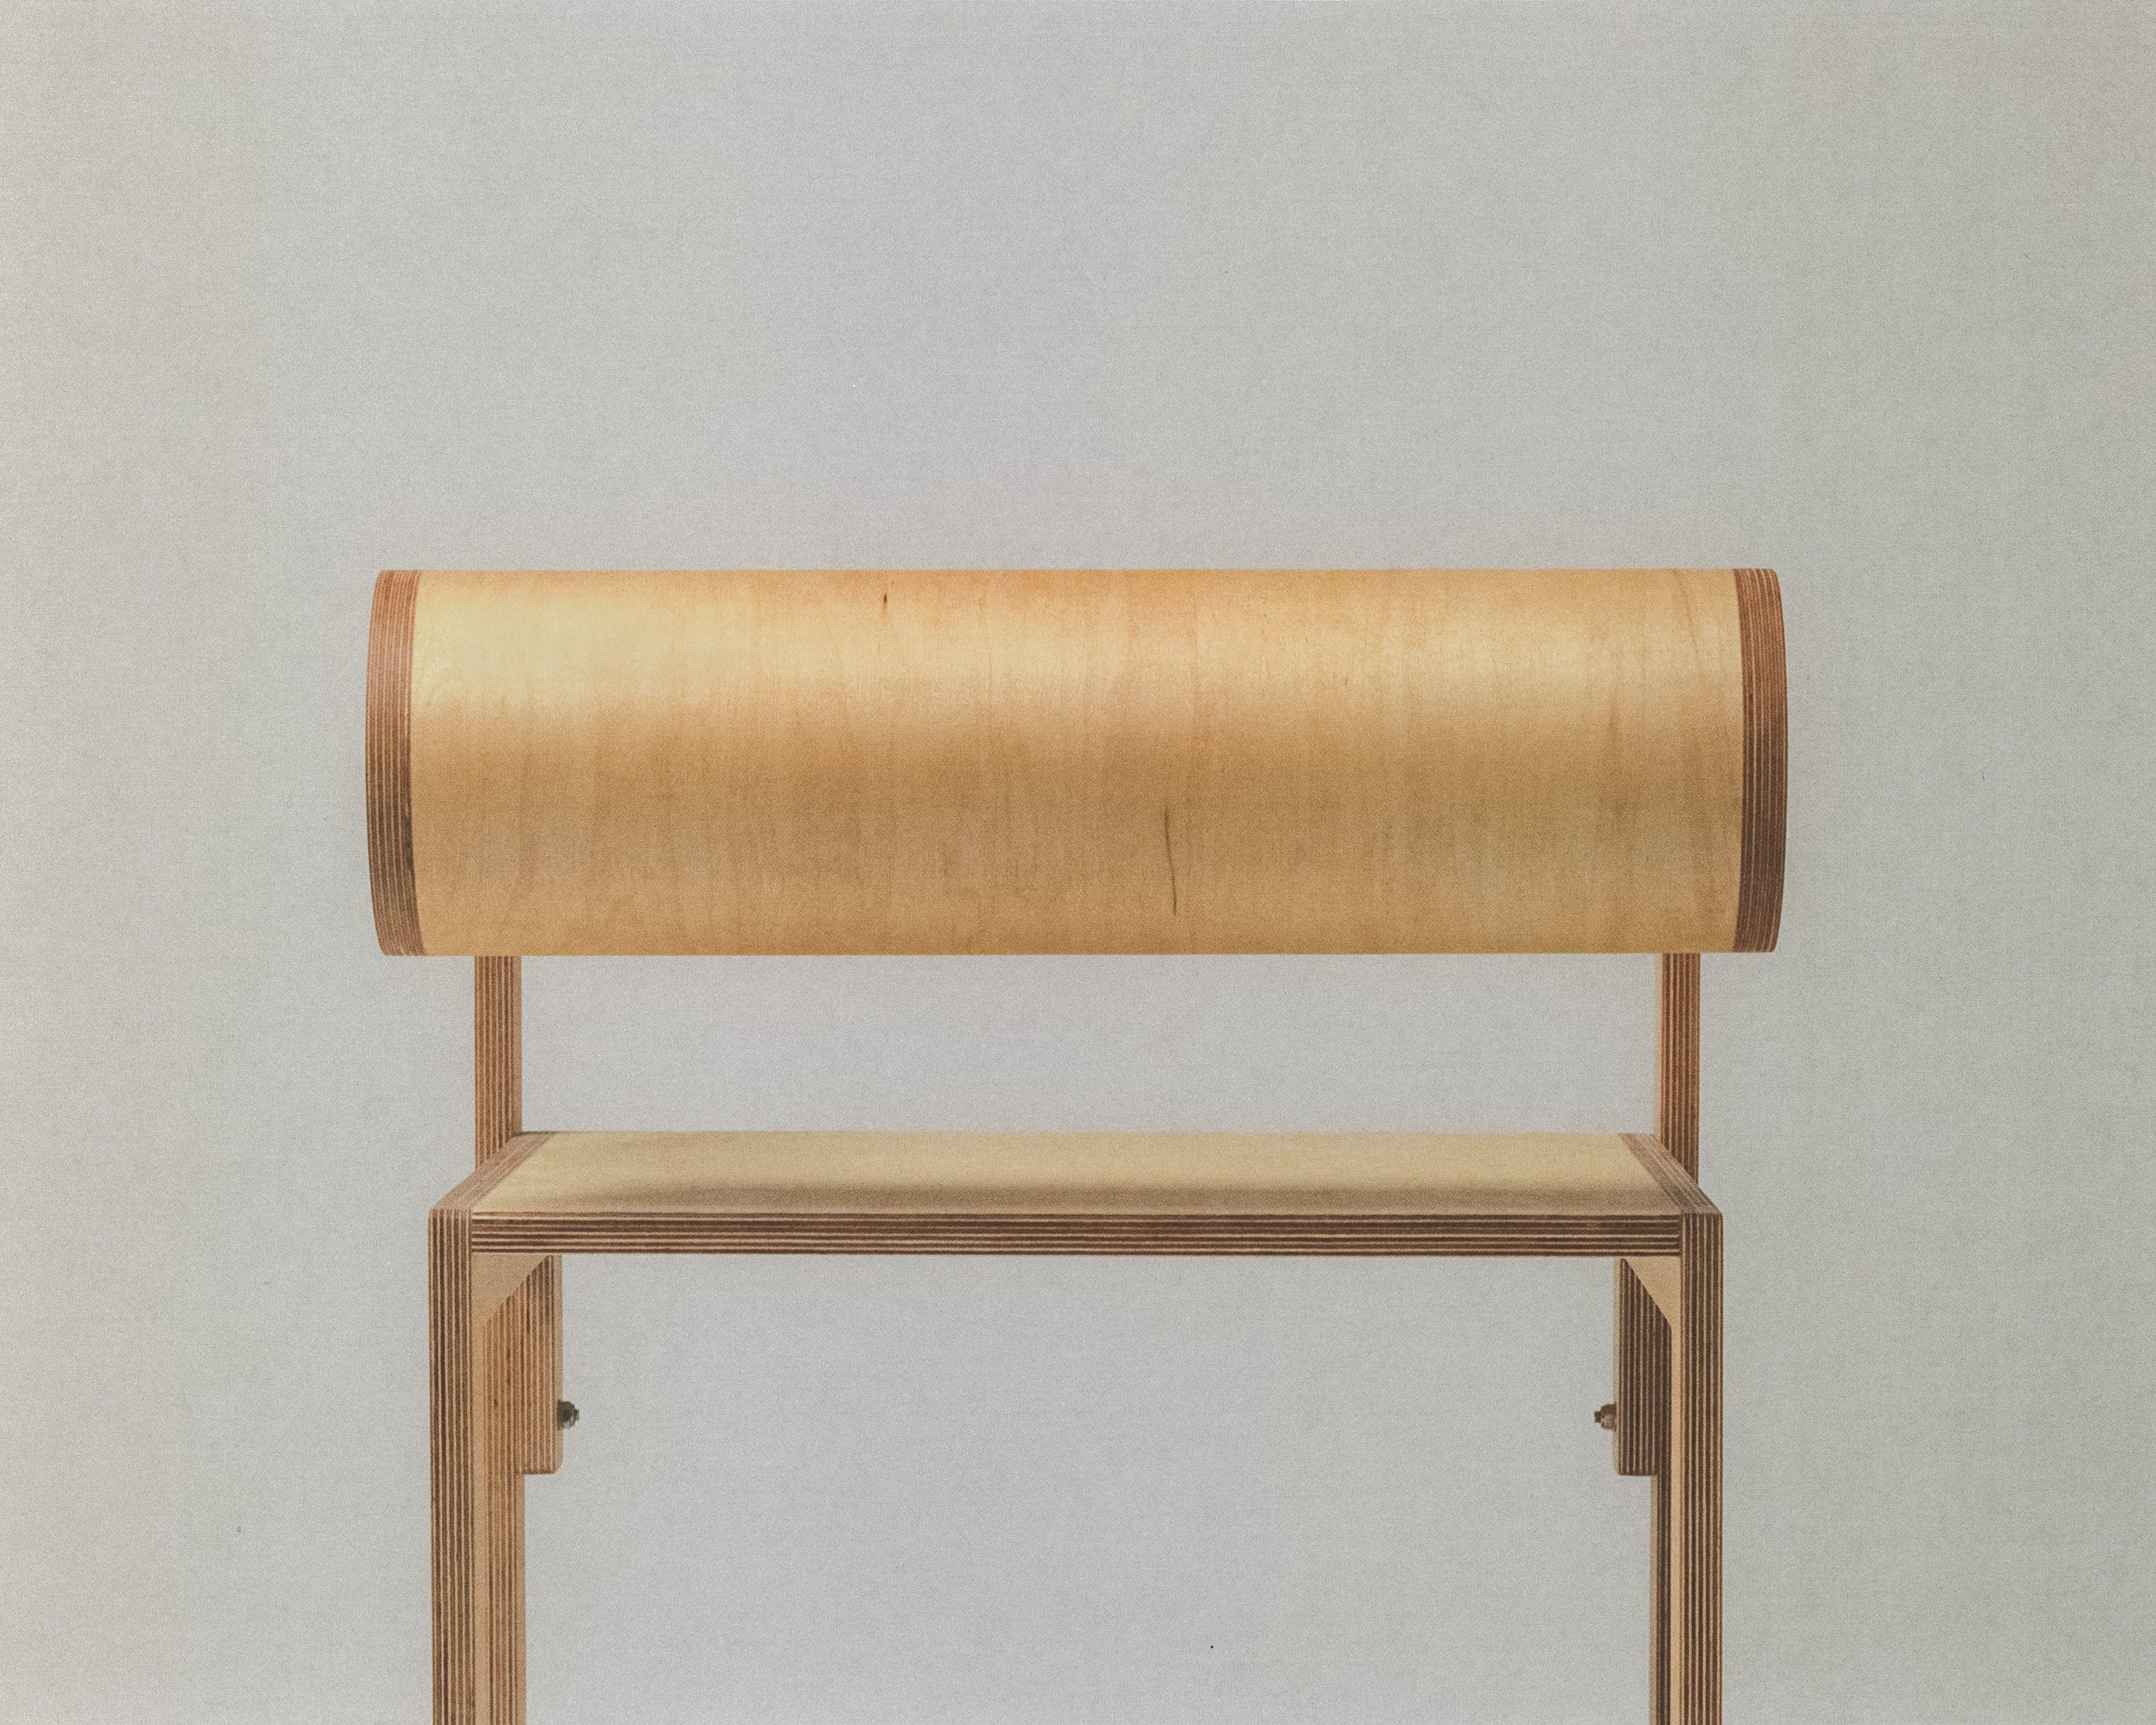 Cylinder Back Arm product image 2